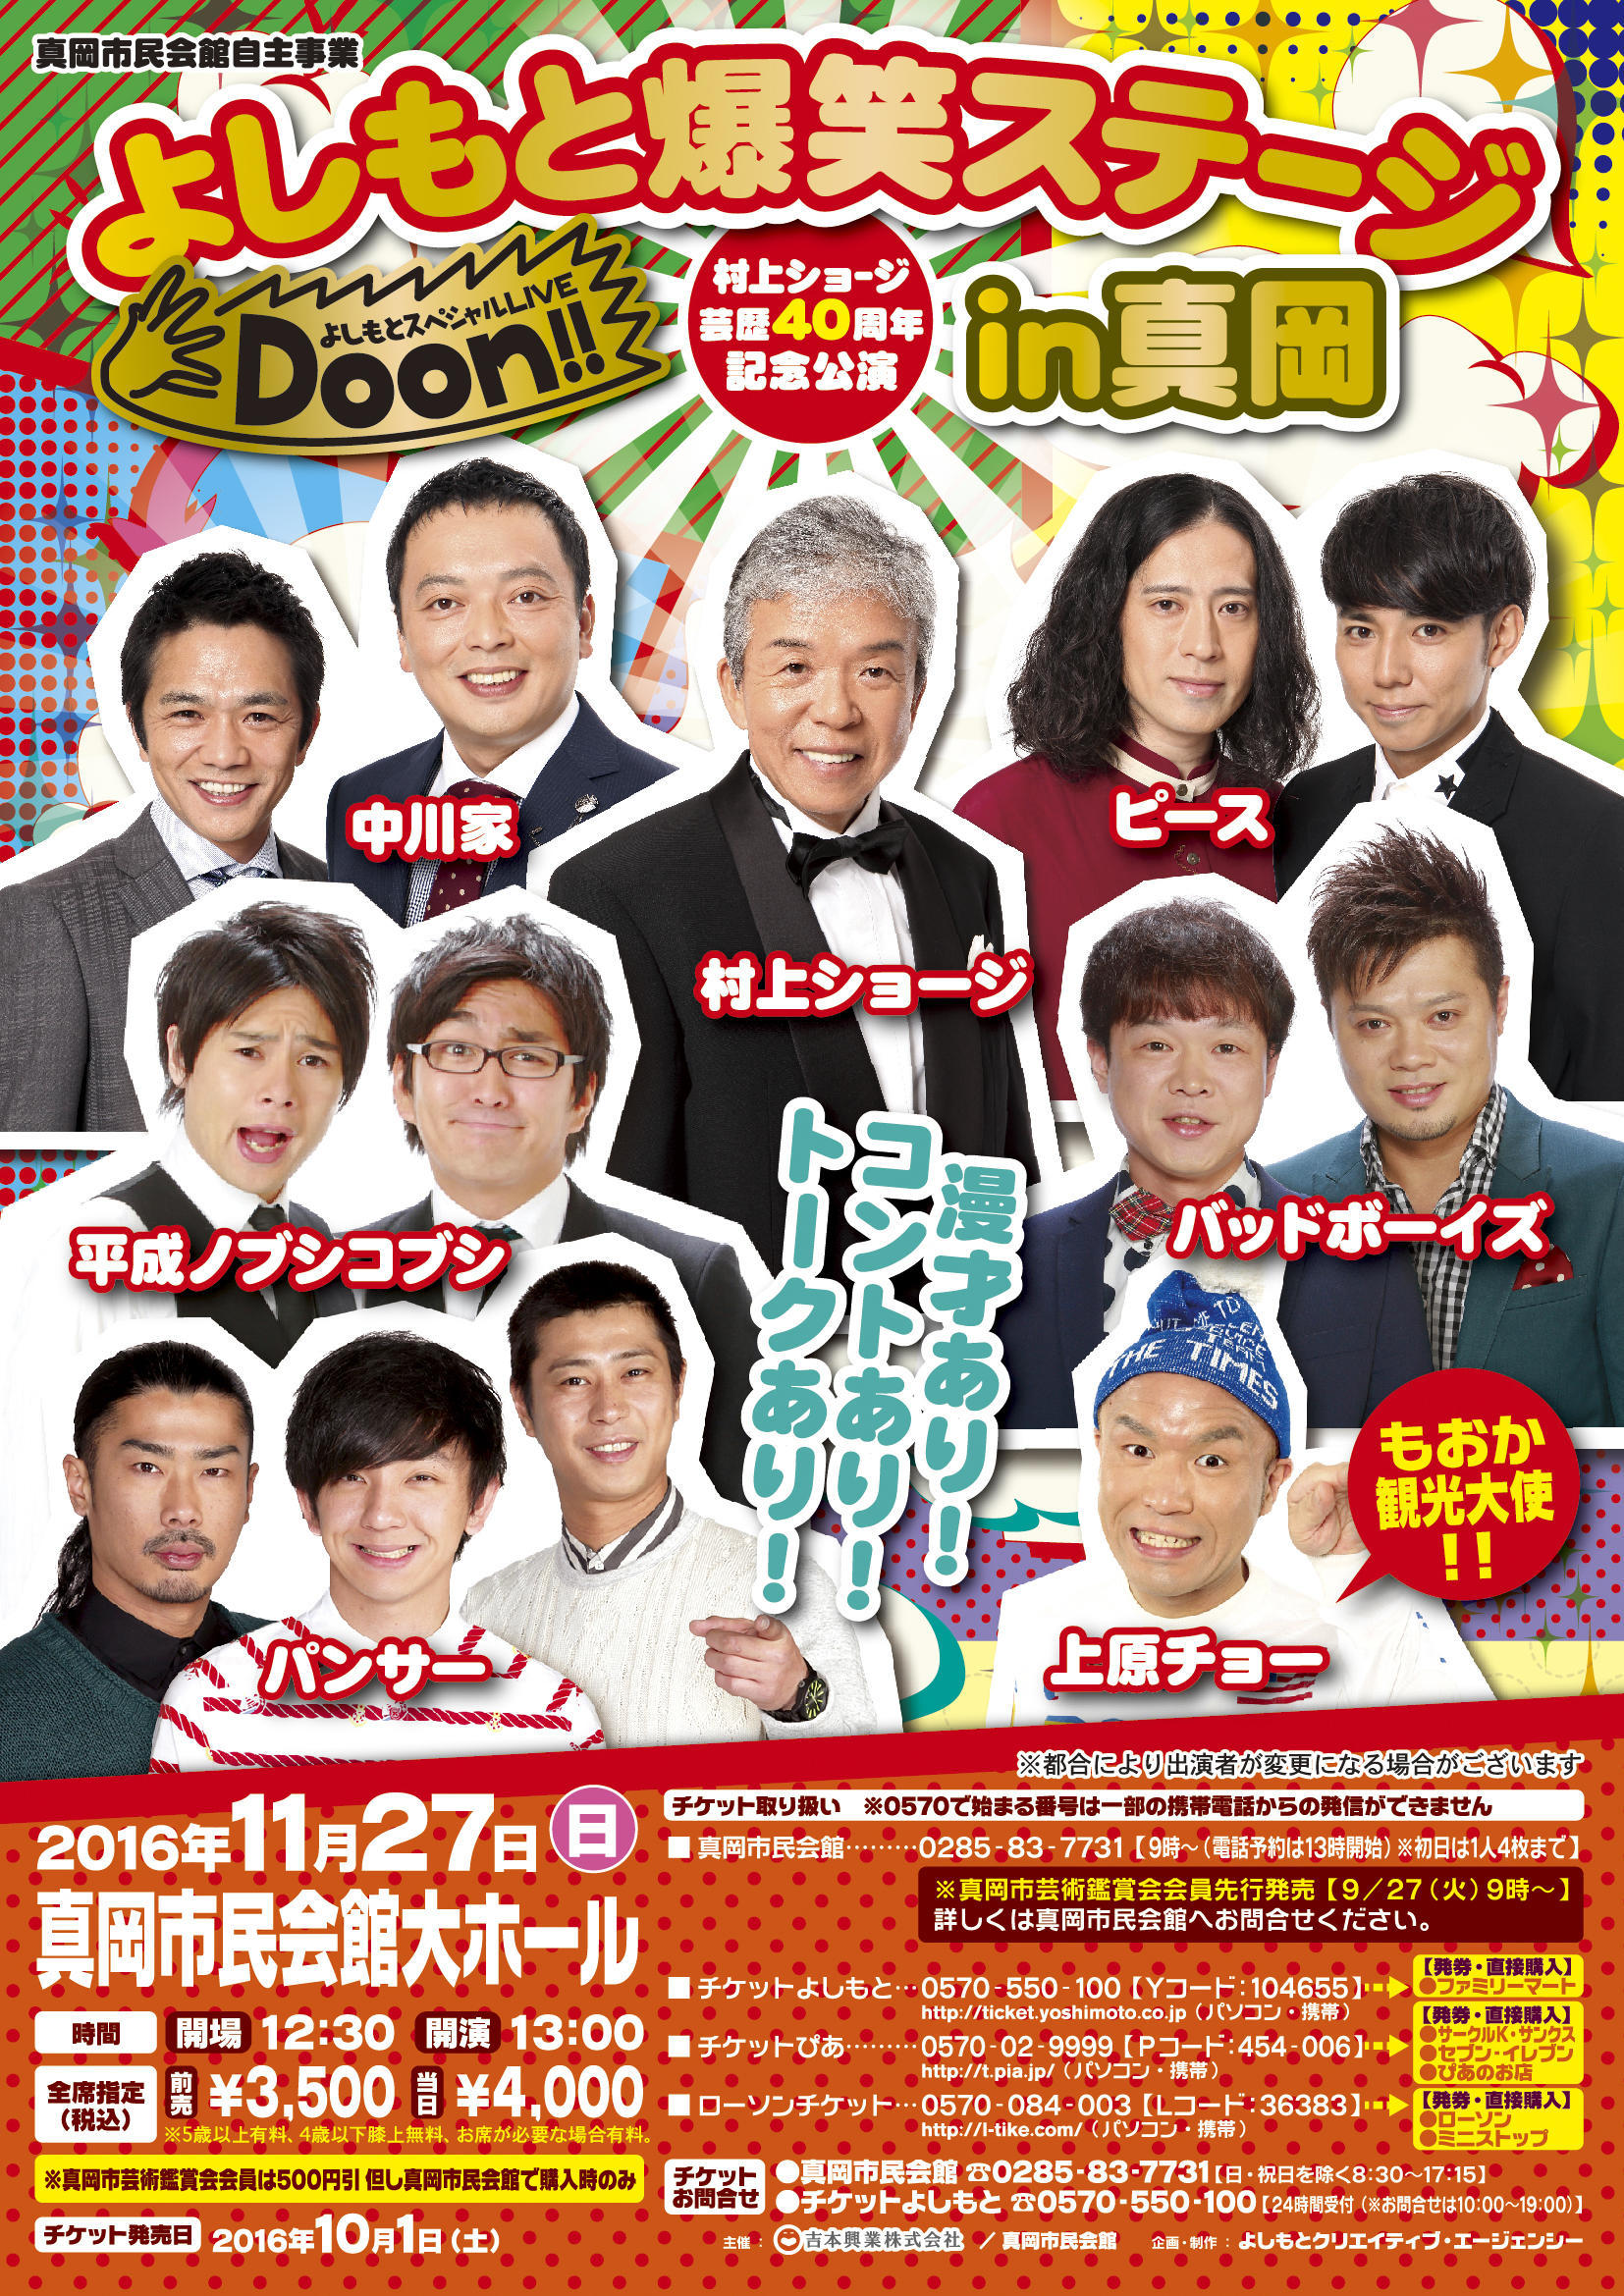 http://www.syumatsu.jp/20160928205627-99ef67da6d8f61e6066a1a961164e6535782e3b8.jpg